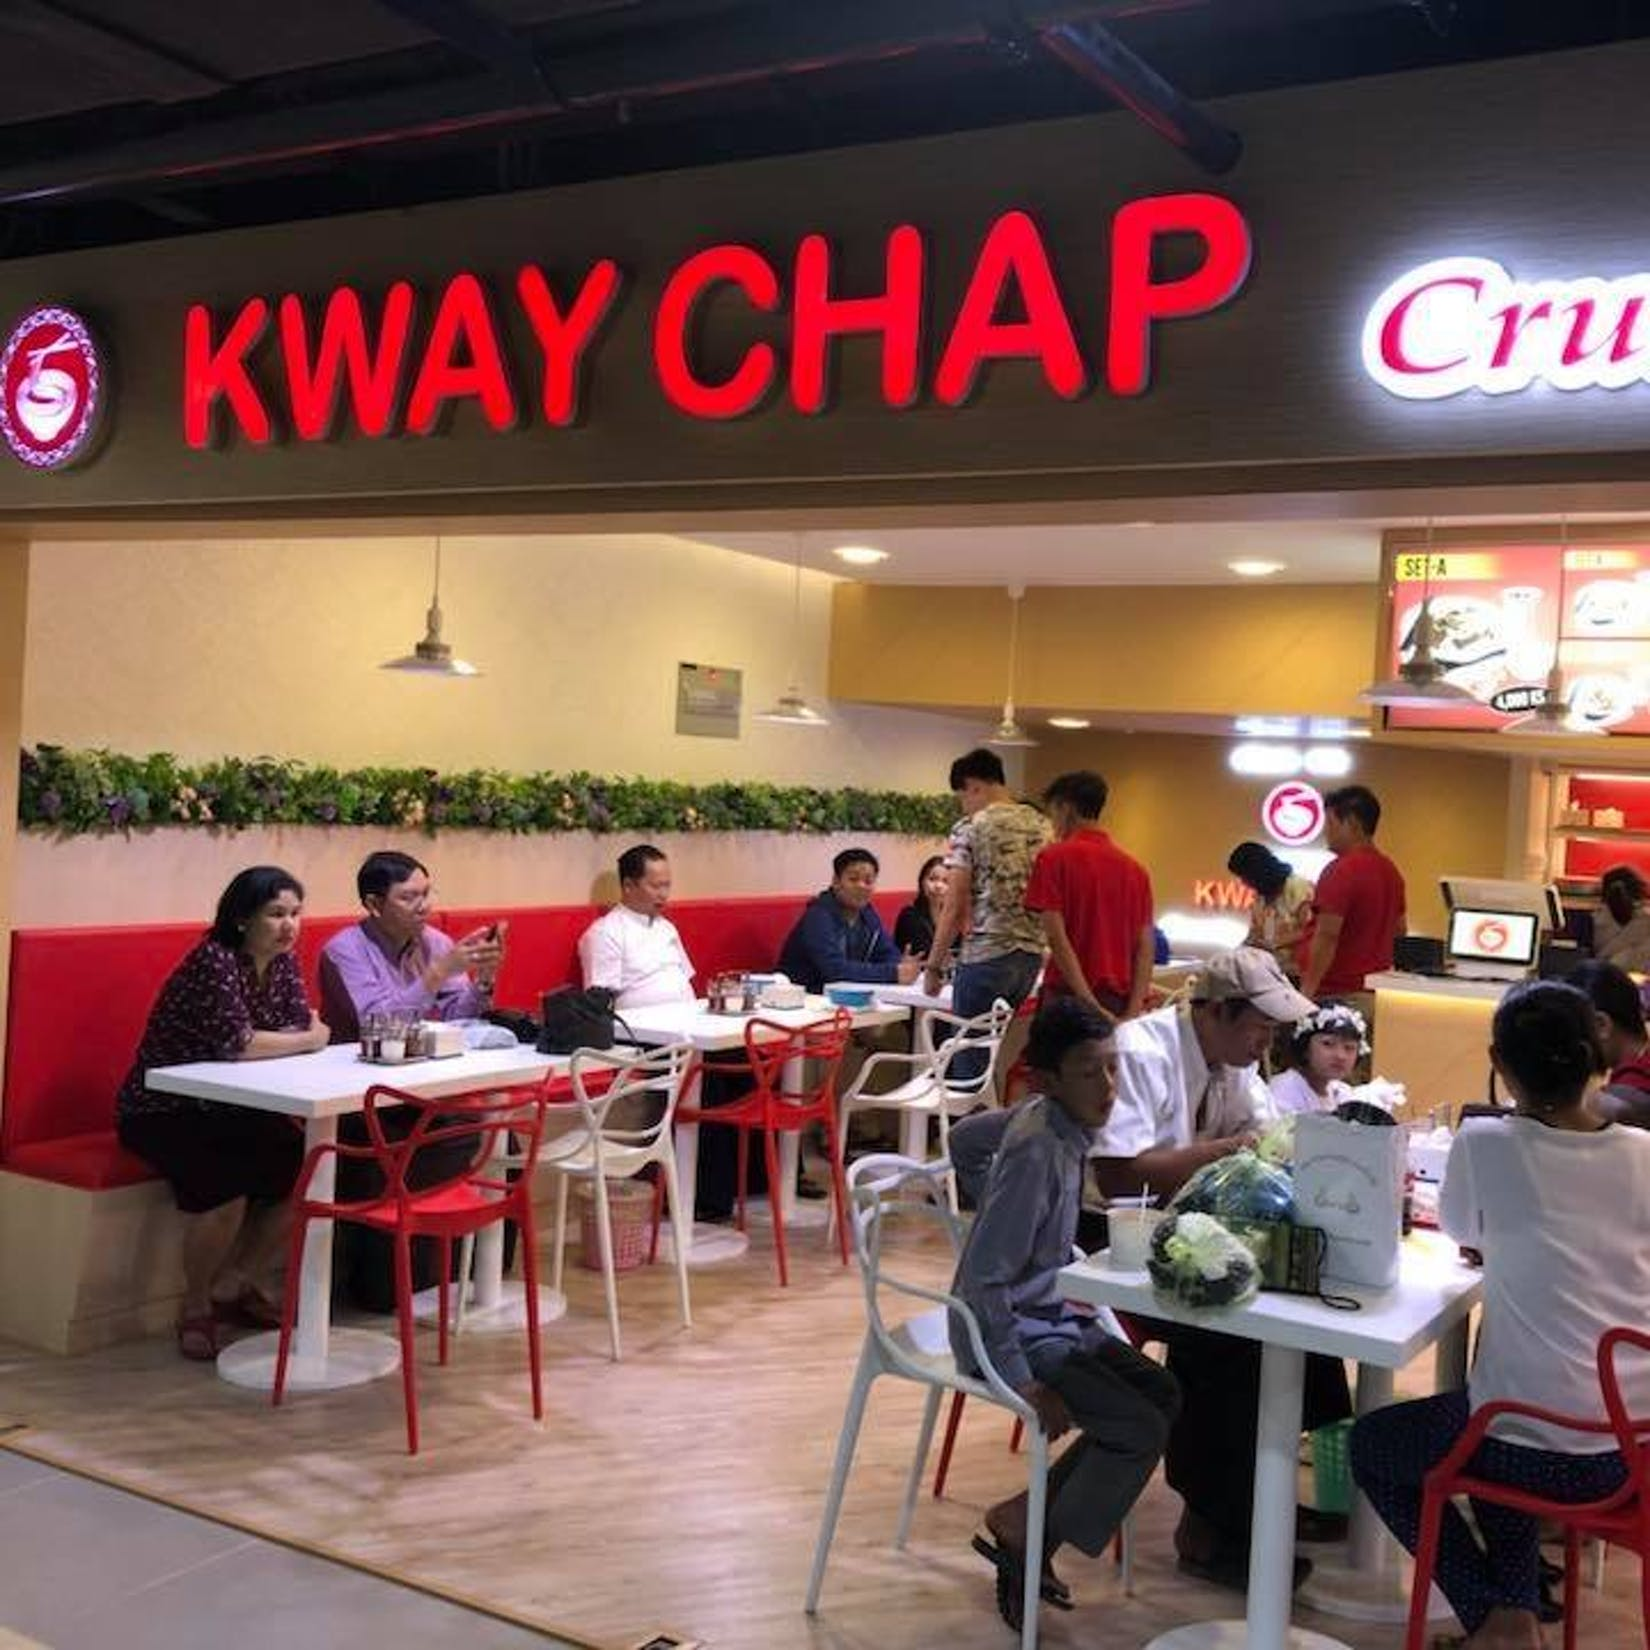 Kway Chap | yathar